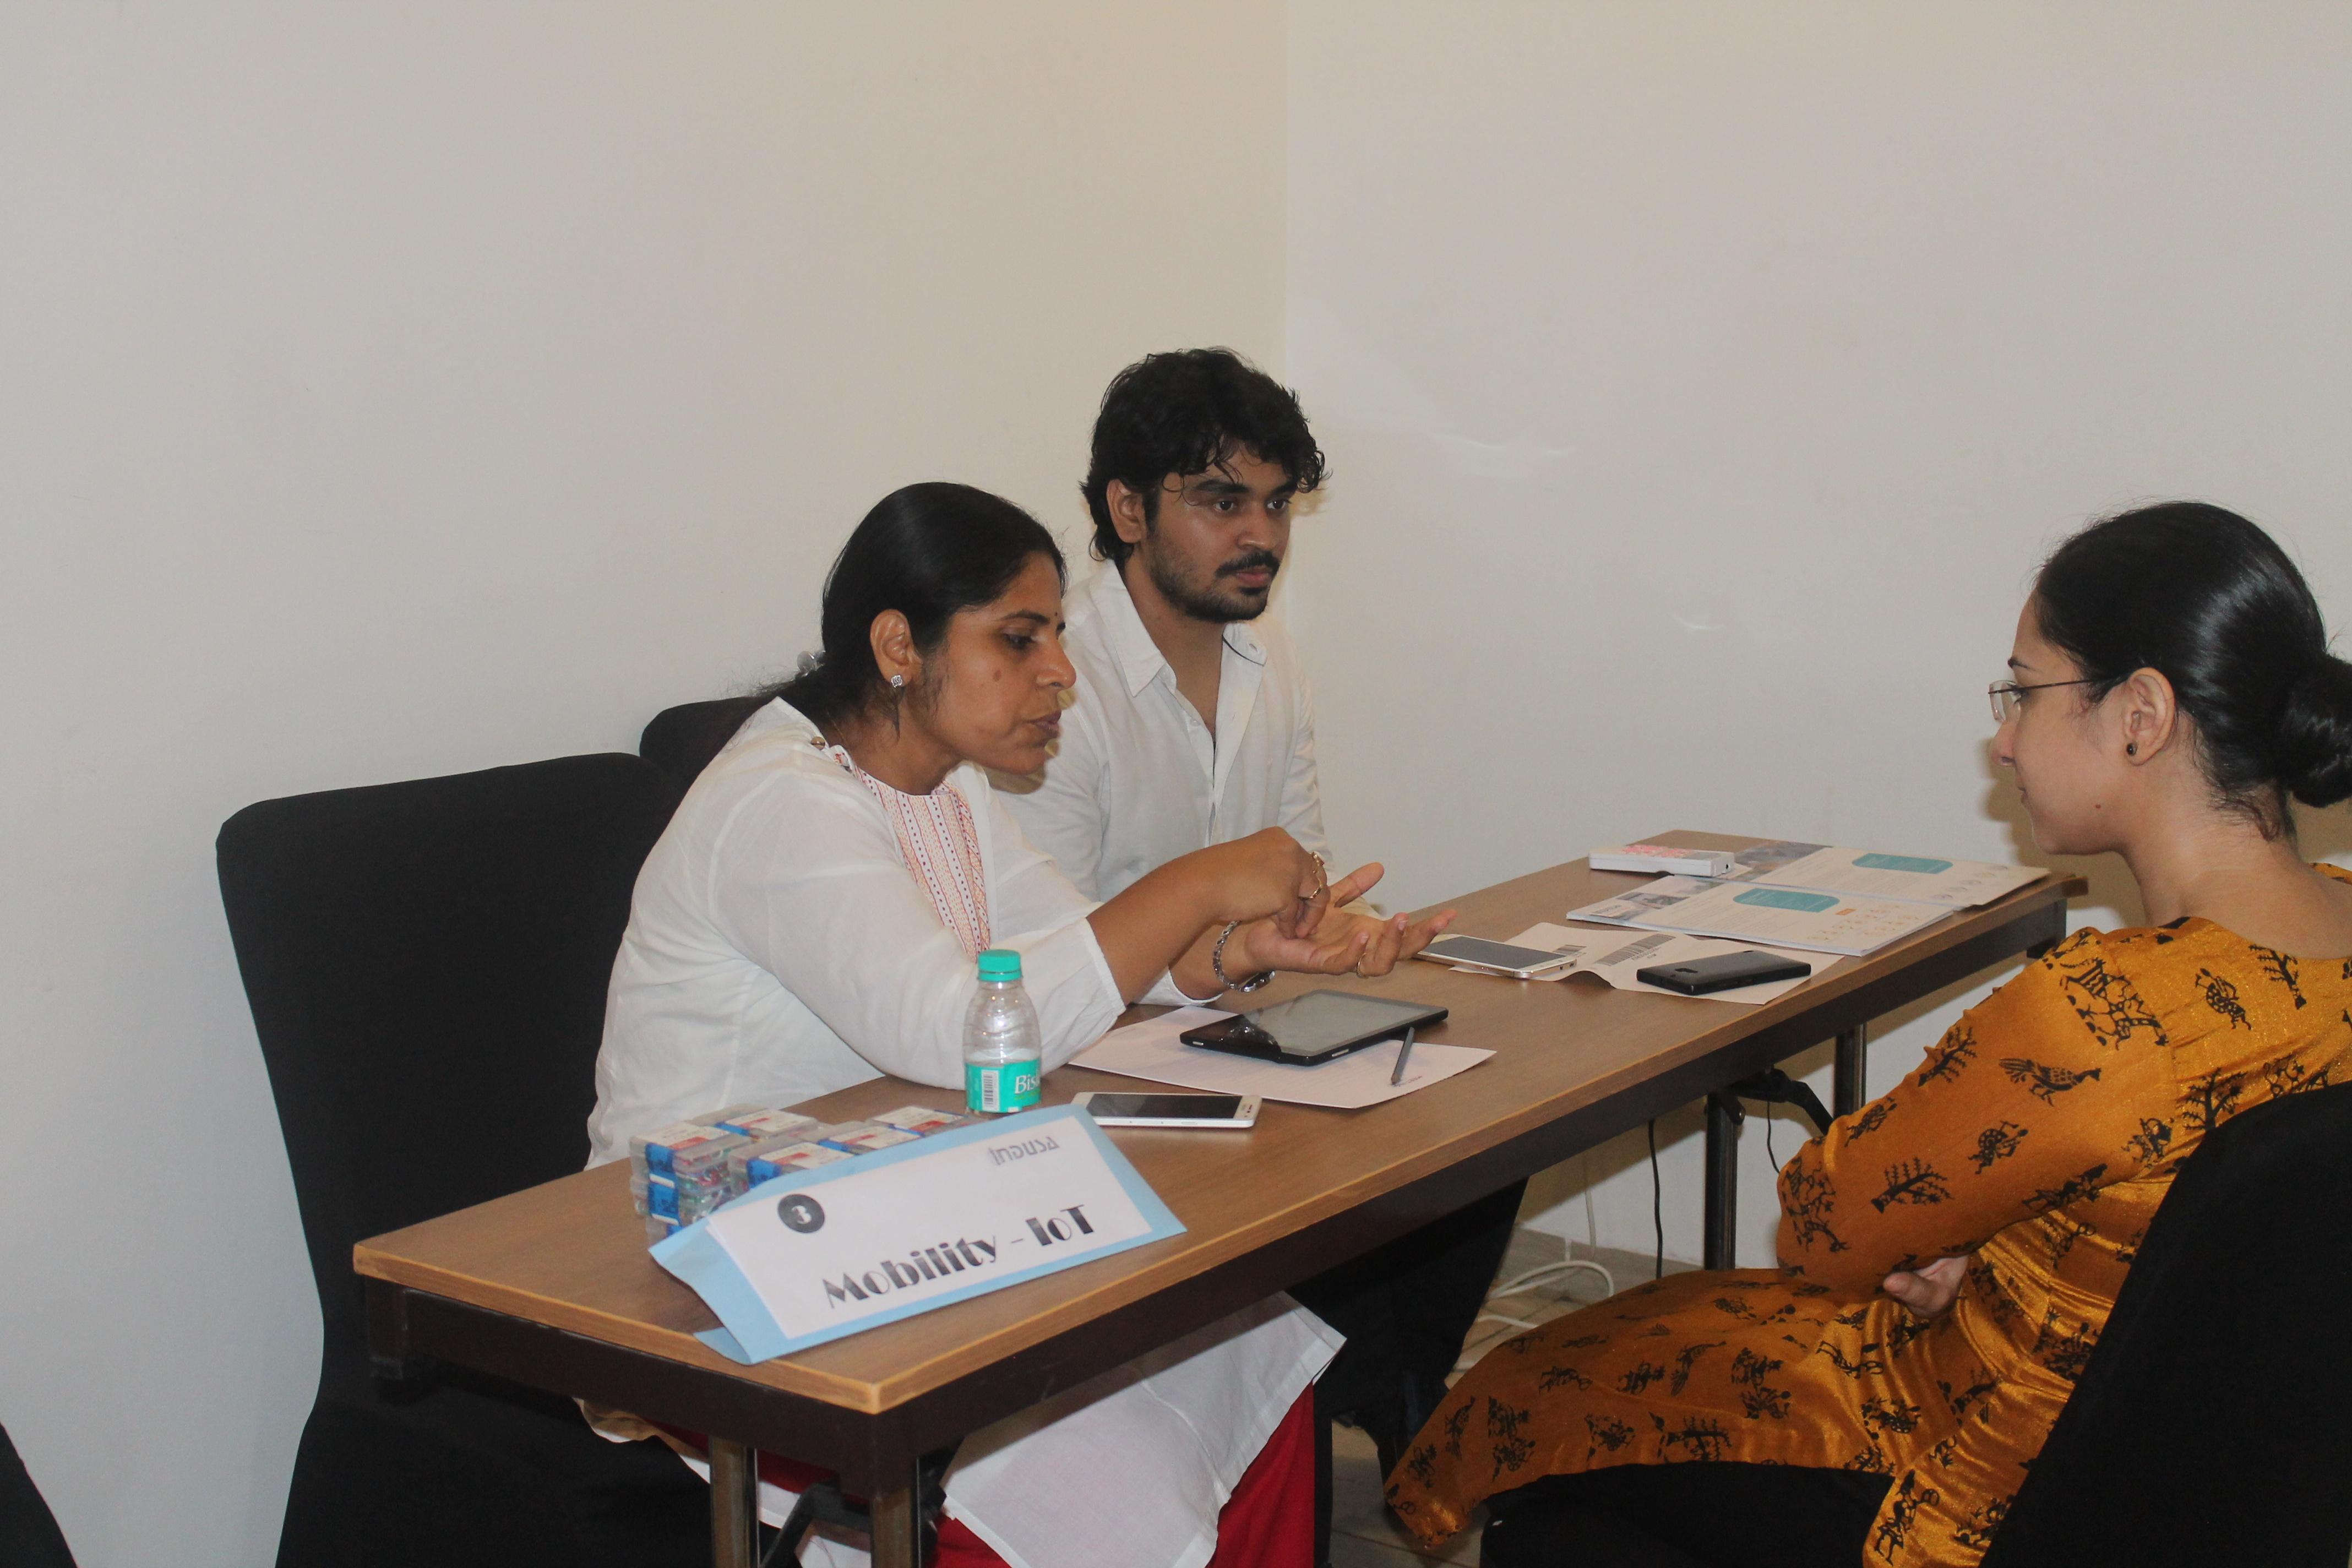 Indusa Dine-n-Learn Event